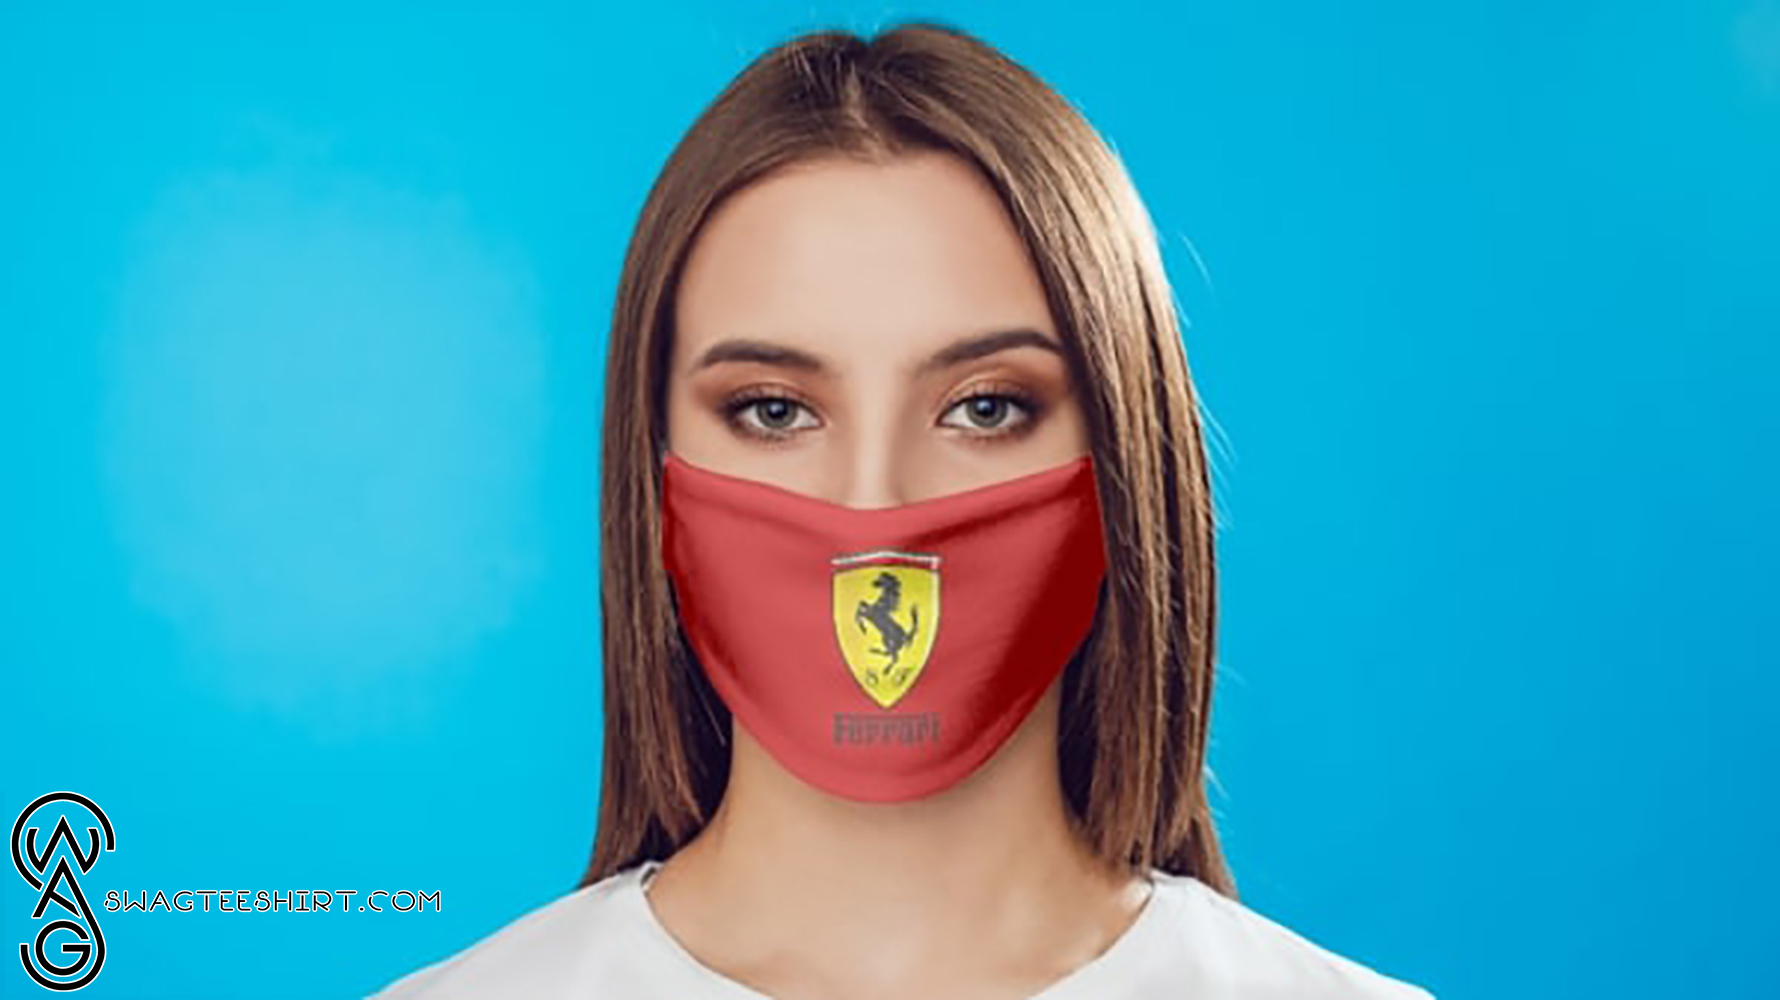 [special edition] Ferrari car logo anti pollution face mask - maria